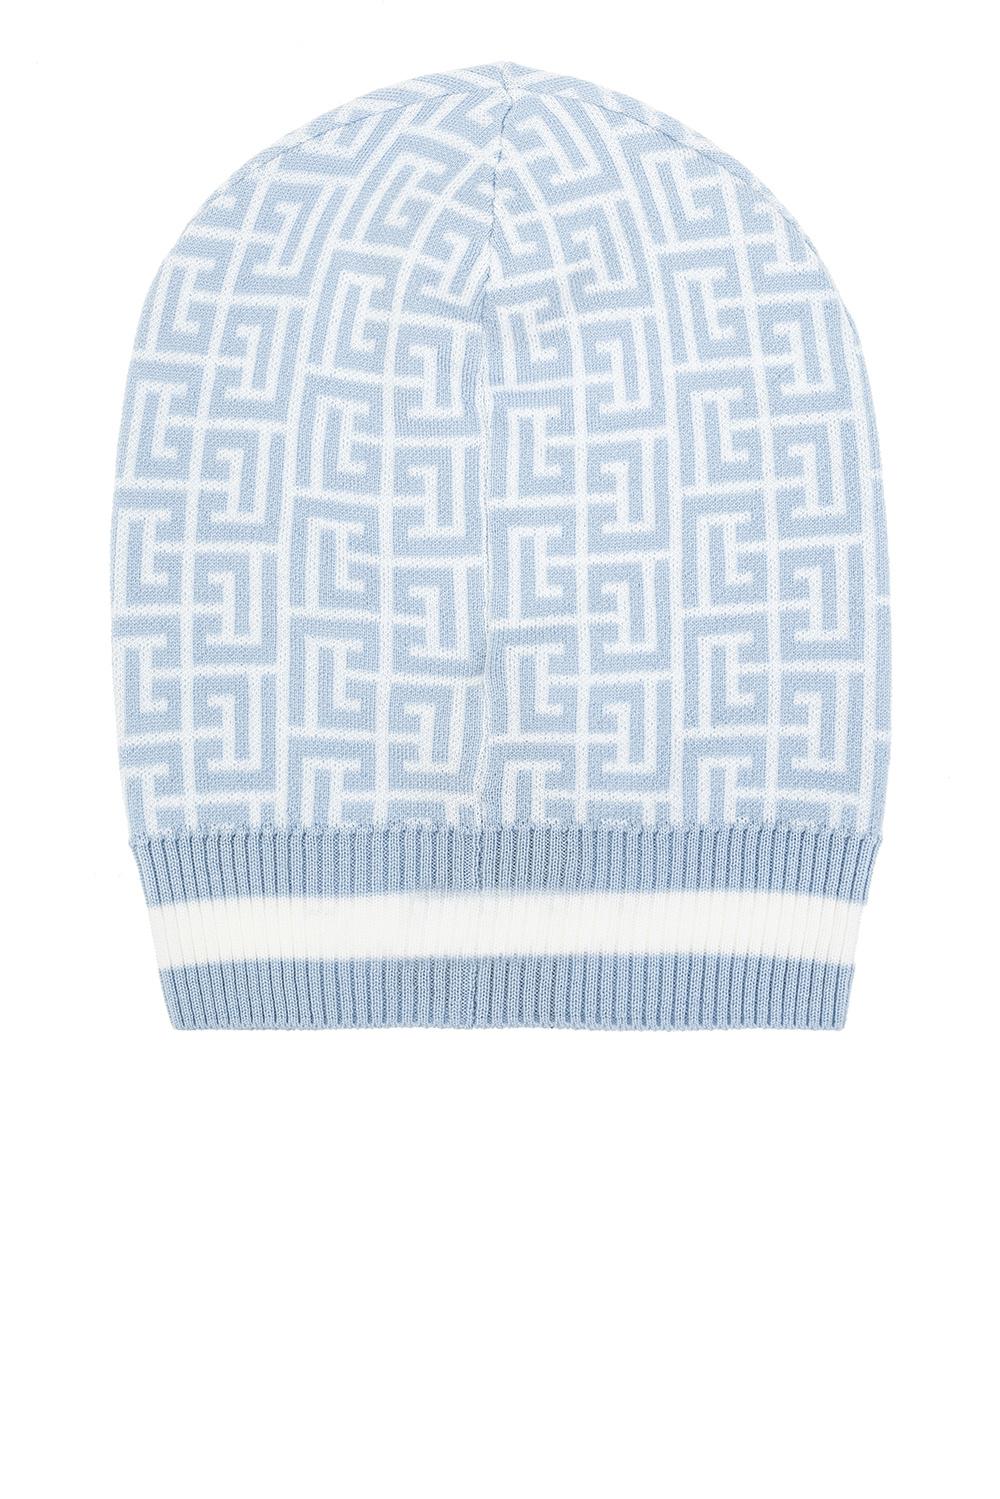 Balmain Hat with logo